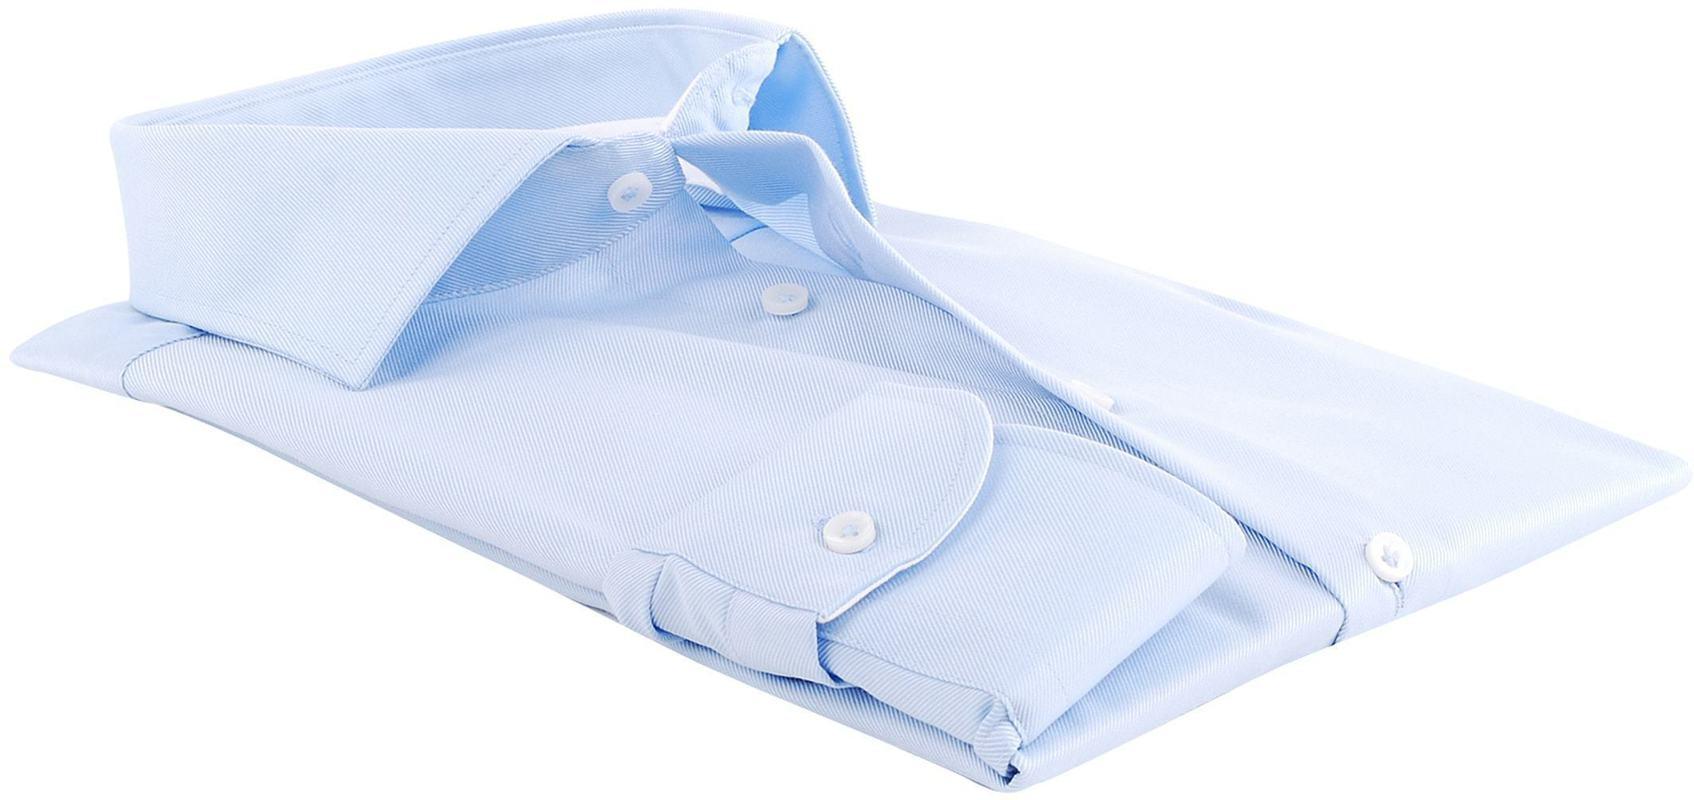 Profuomo shirt Blue + White Contrast